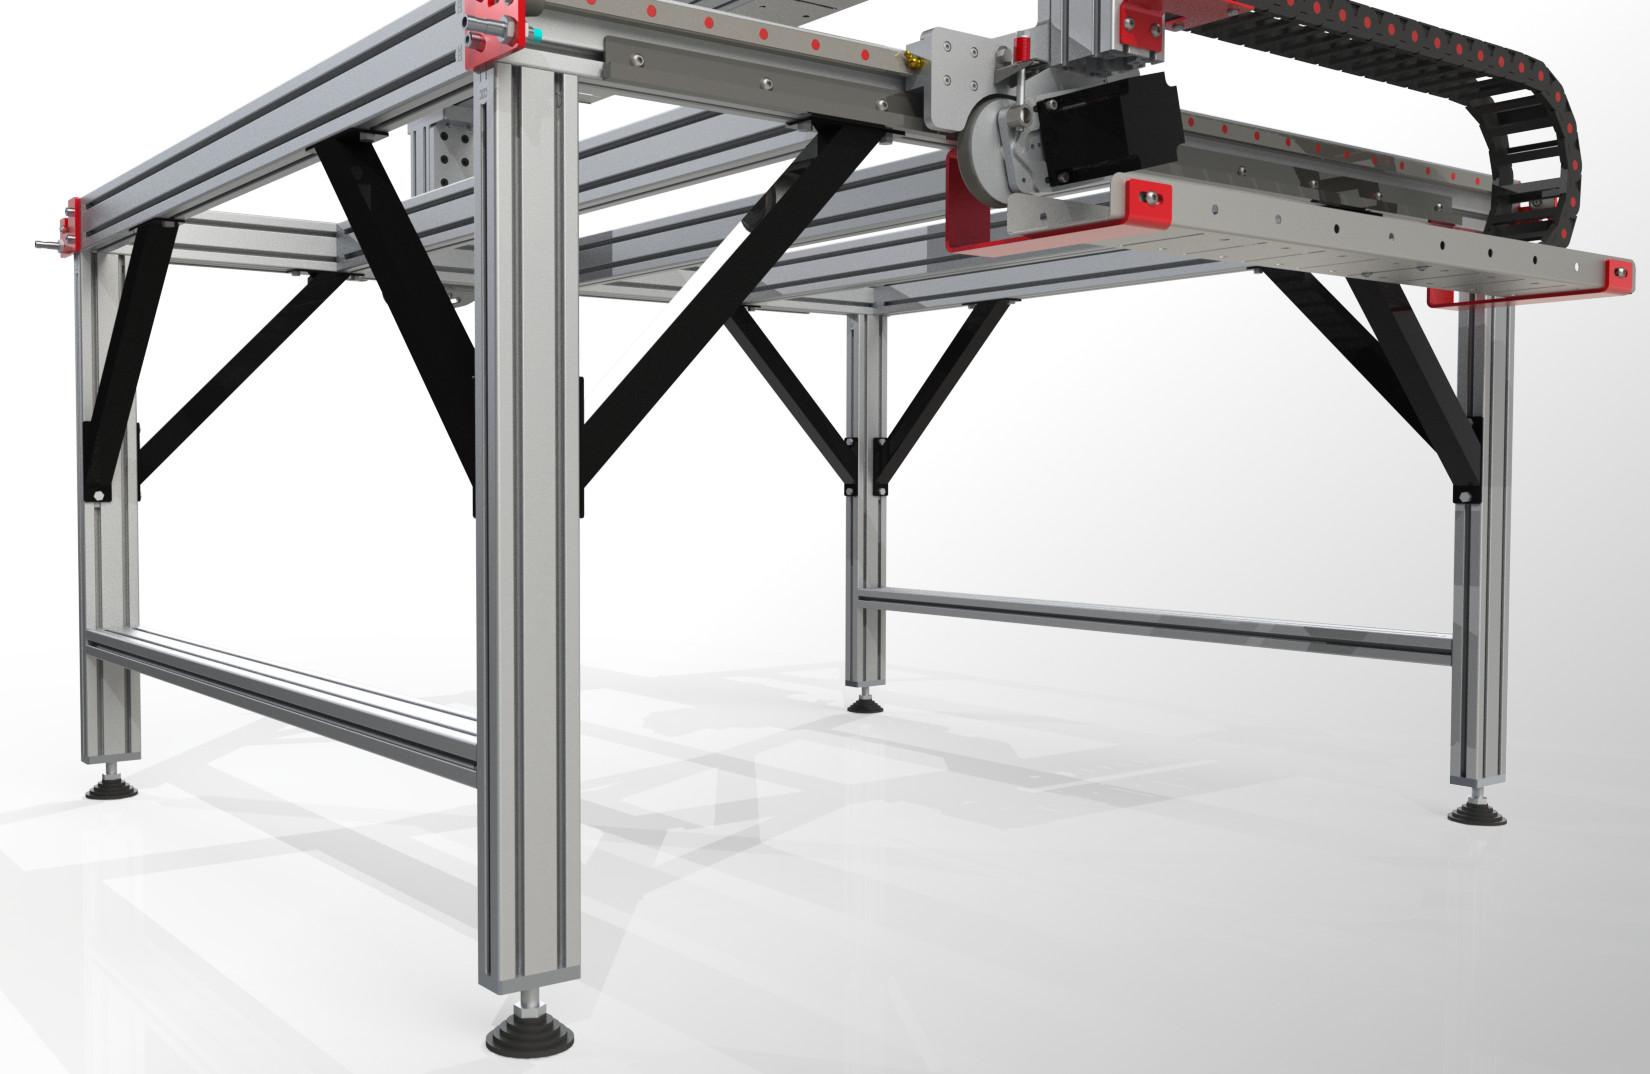 X4 Leveling Kit >> Leg Kit Assembly Instructions | CNCRouterParts